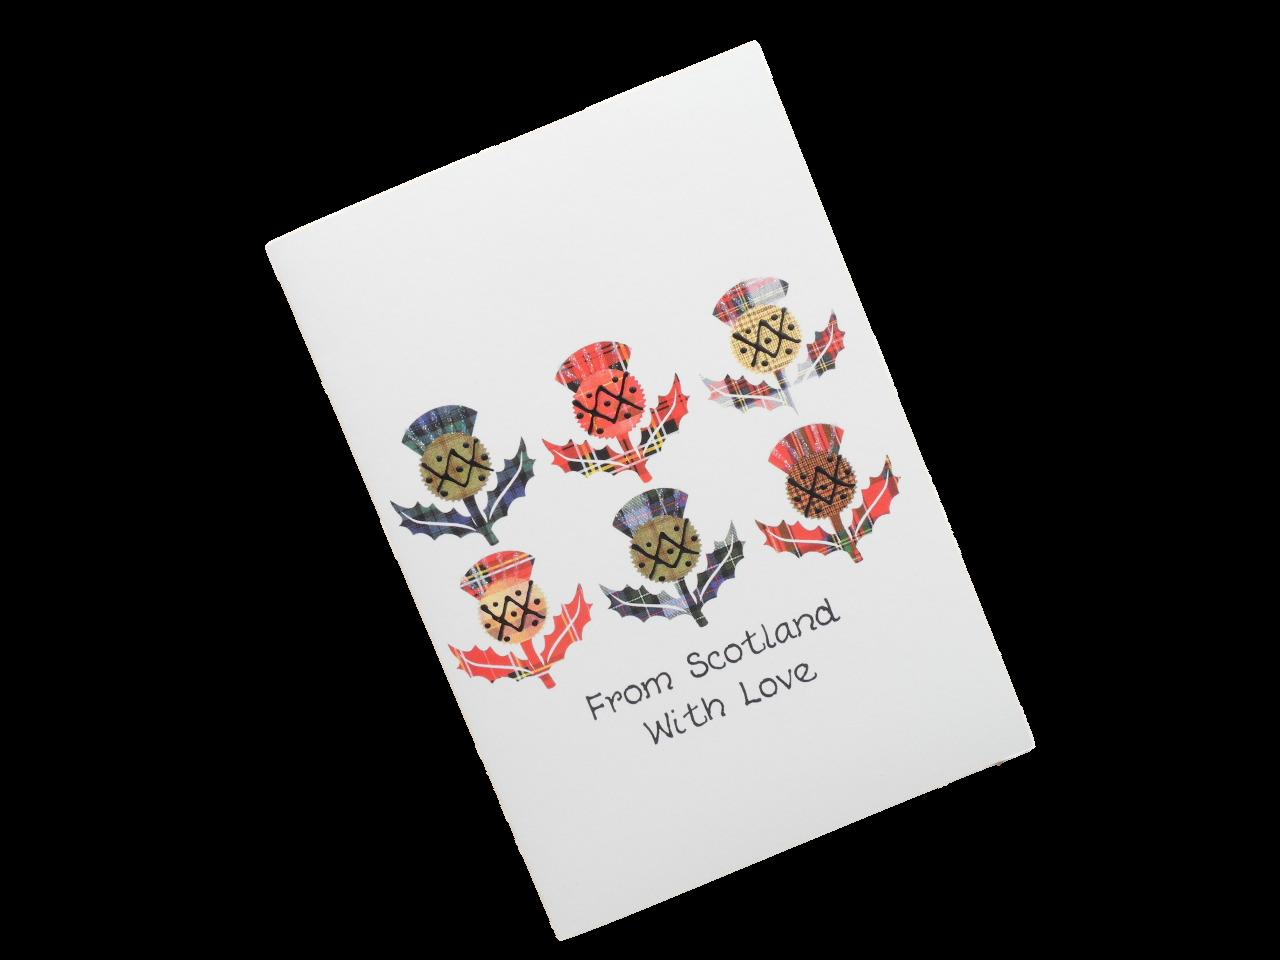 scottish card from scotland tartan thistles